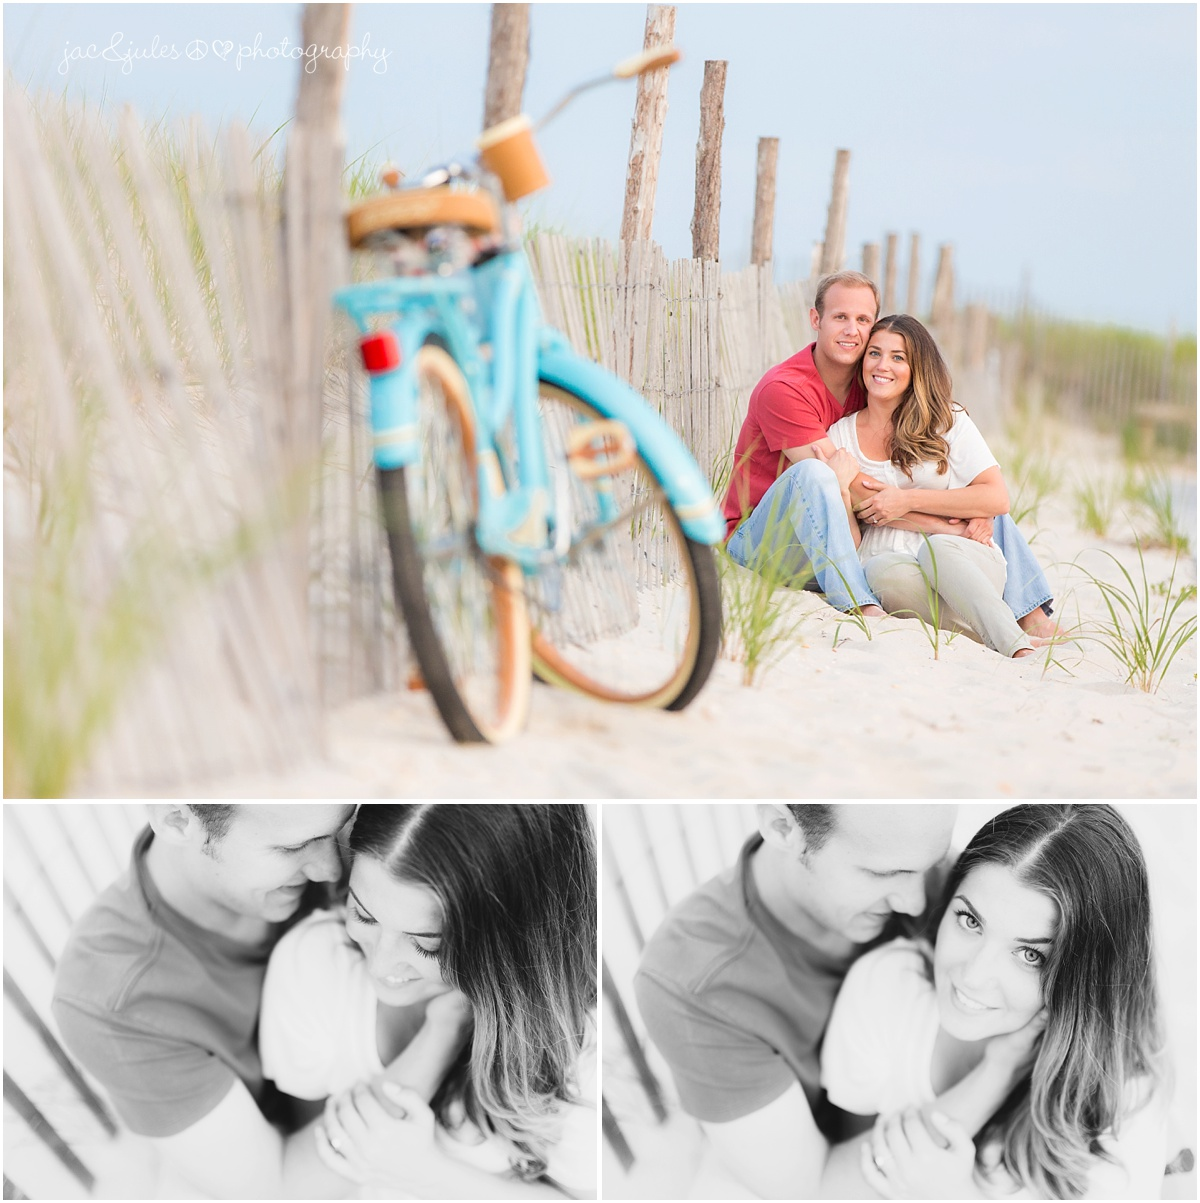 engaged couple snuggles on the beach near their parked beach cruiser bike.